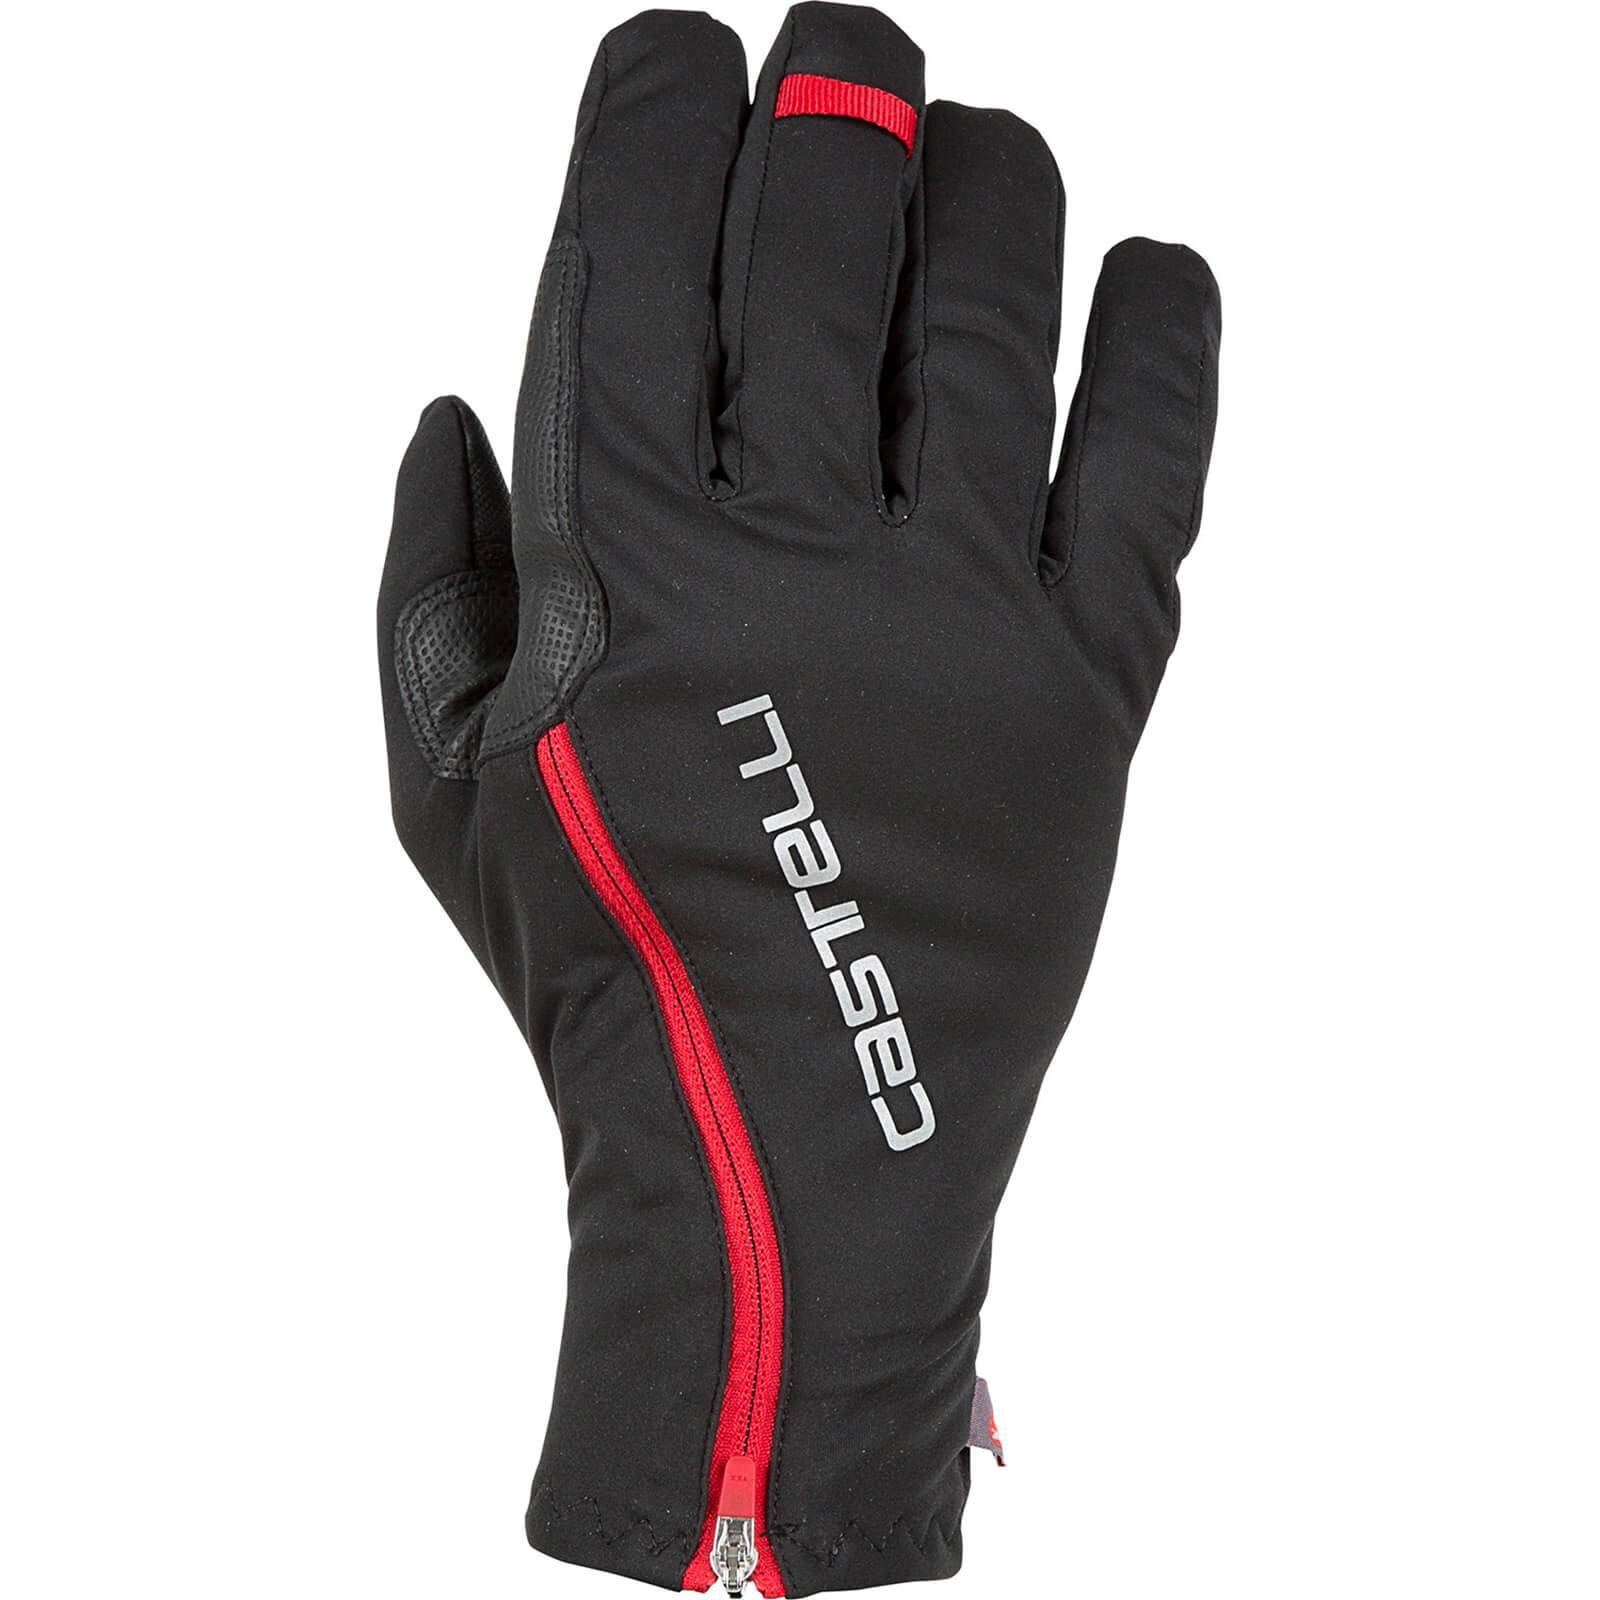 Castelli Spettacolo RoS Gloves - M - Black/Red